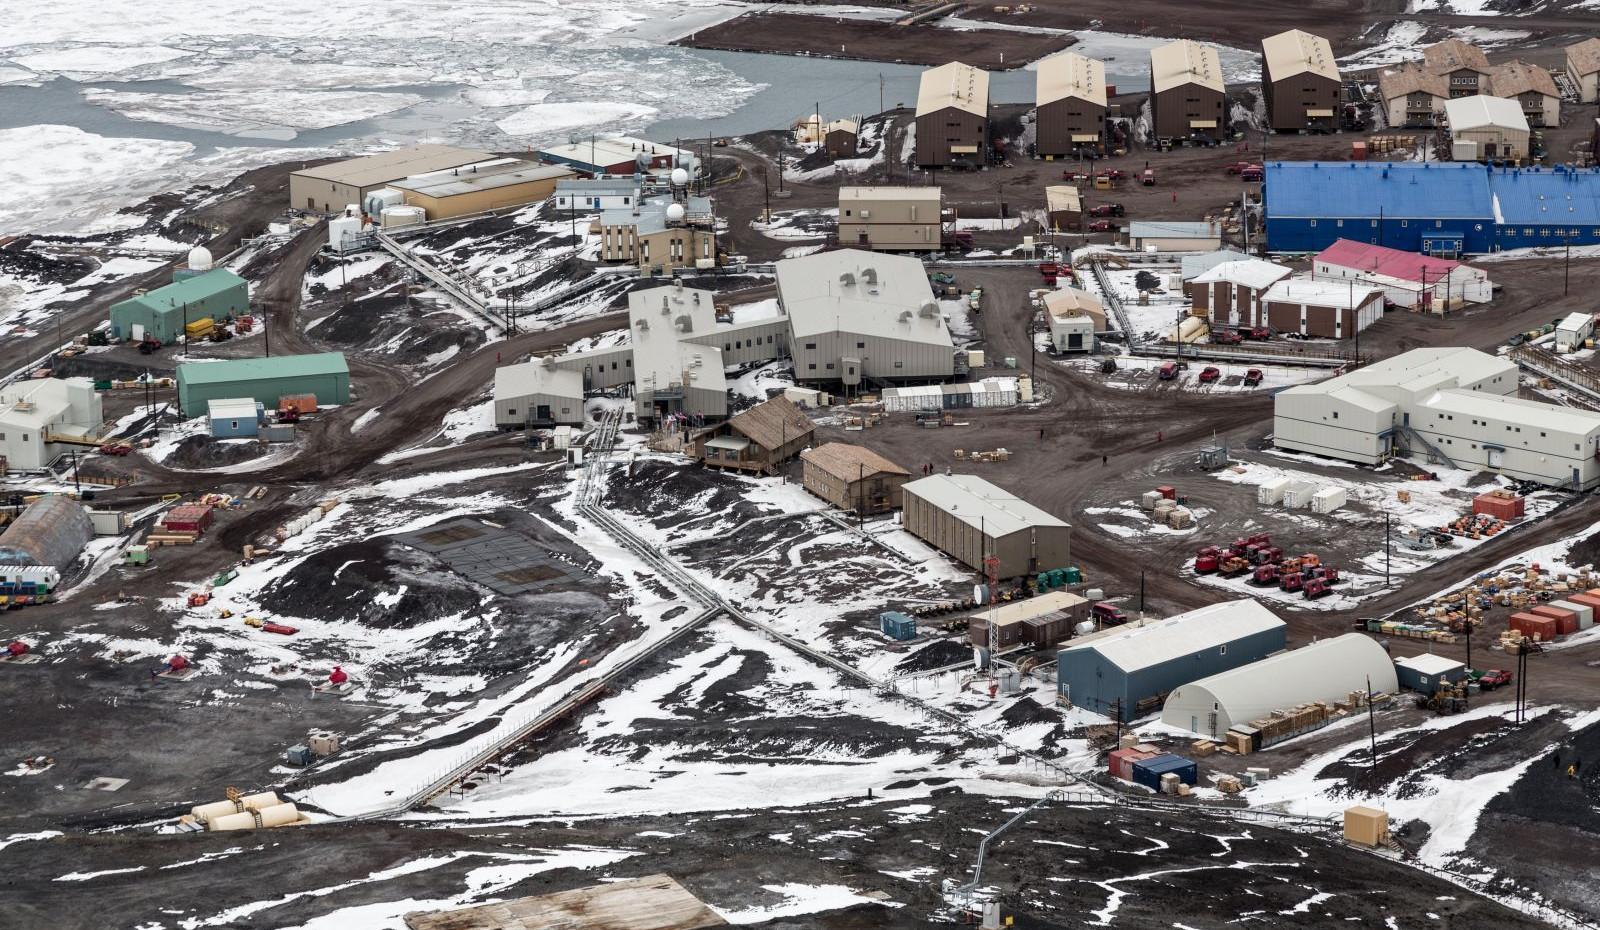 Ross Island - McMurdo Station